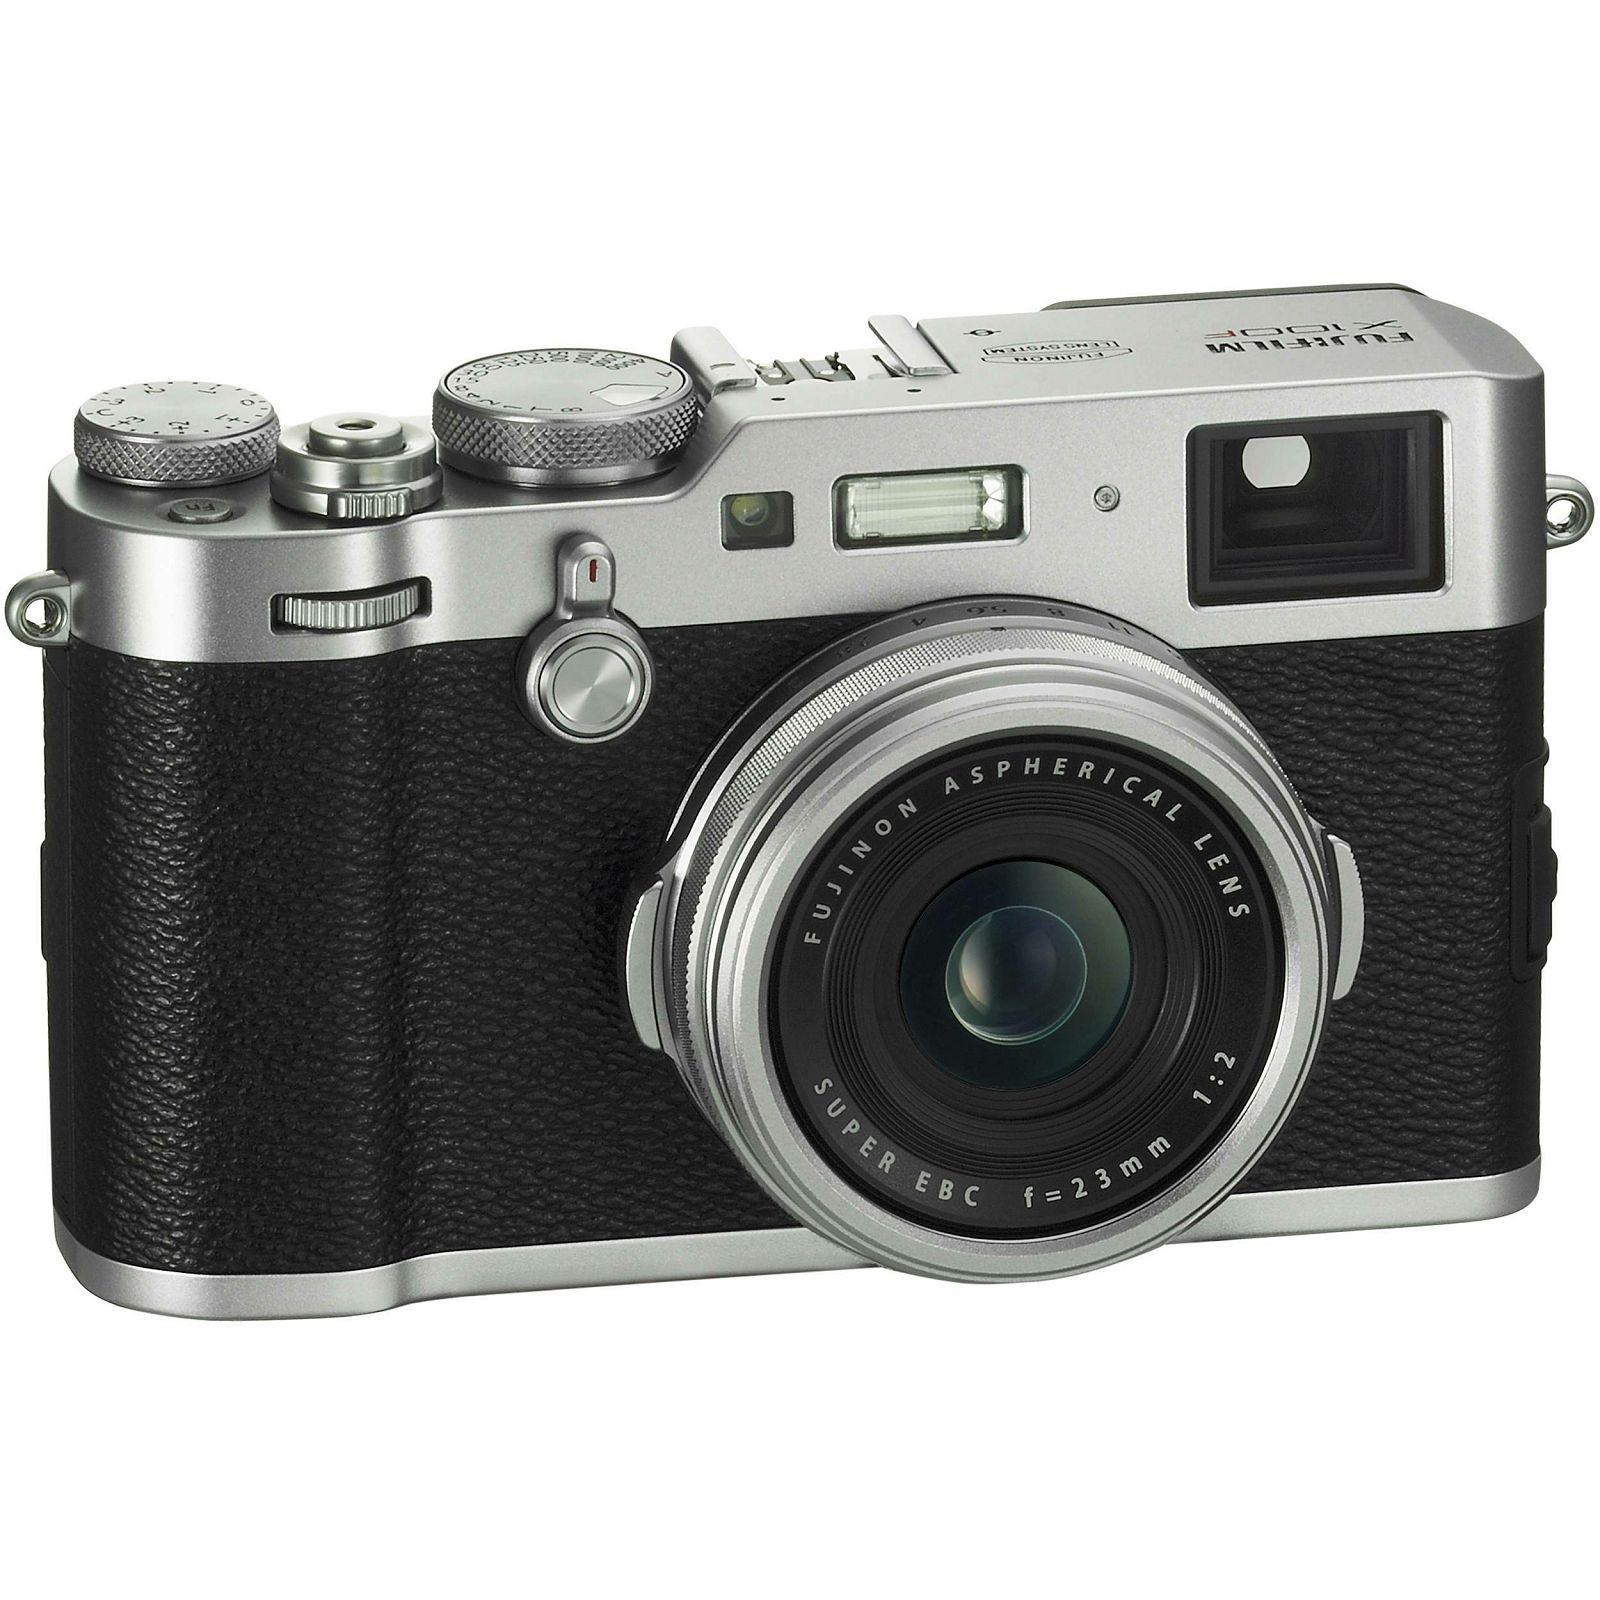 Fujifilm X-100F Silver digitalni fotoaparat s integriranim objektivom  Srebreni Fuji X100F